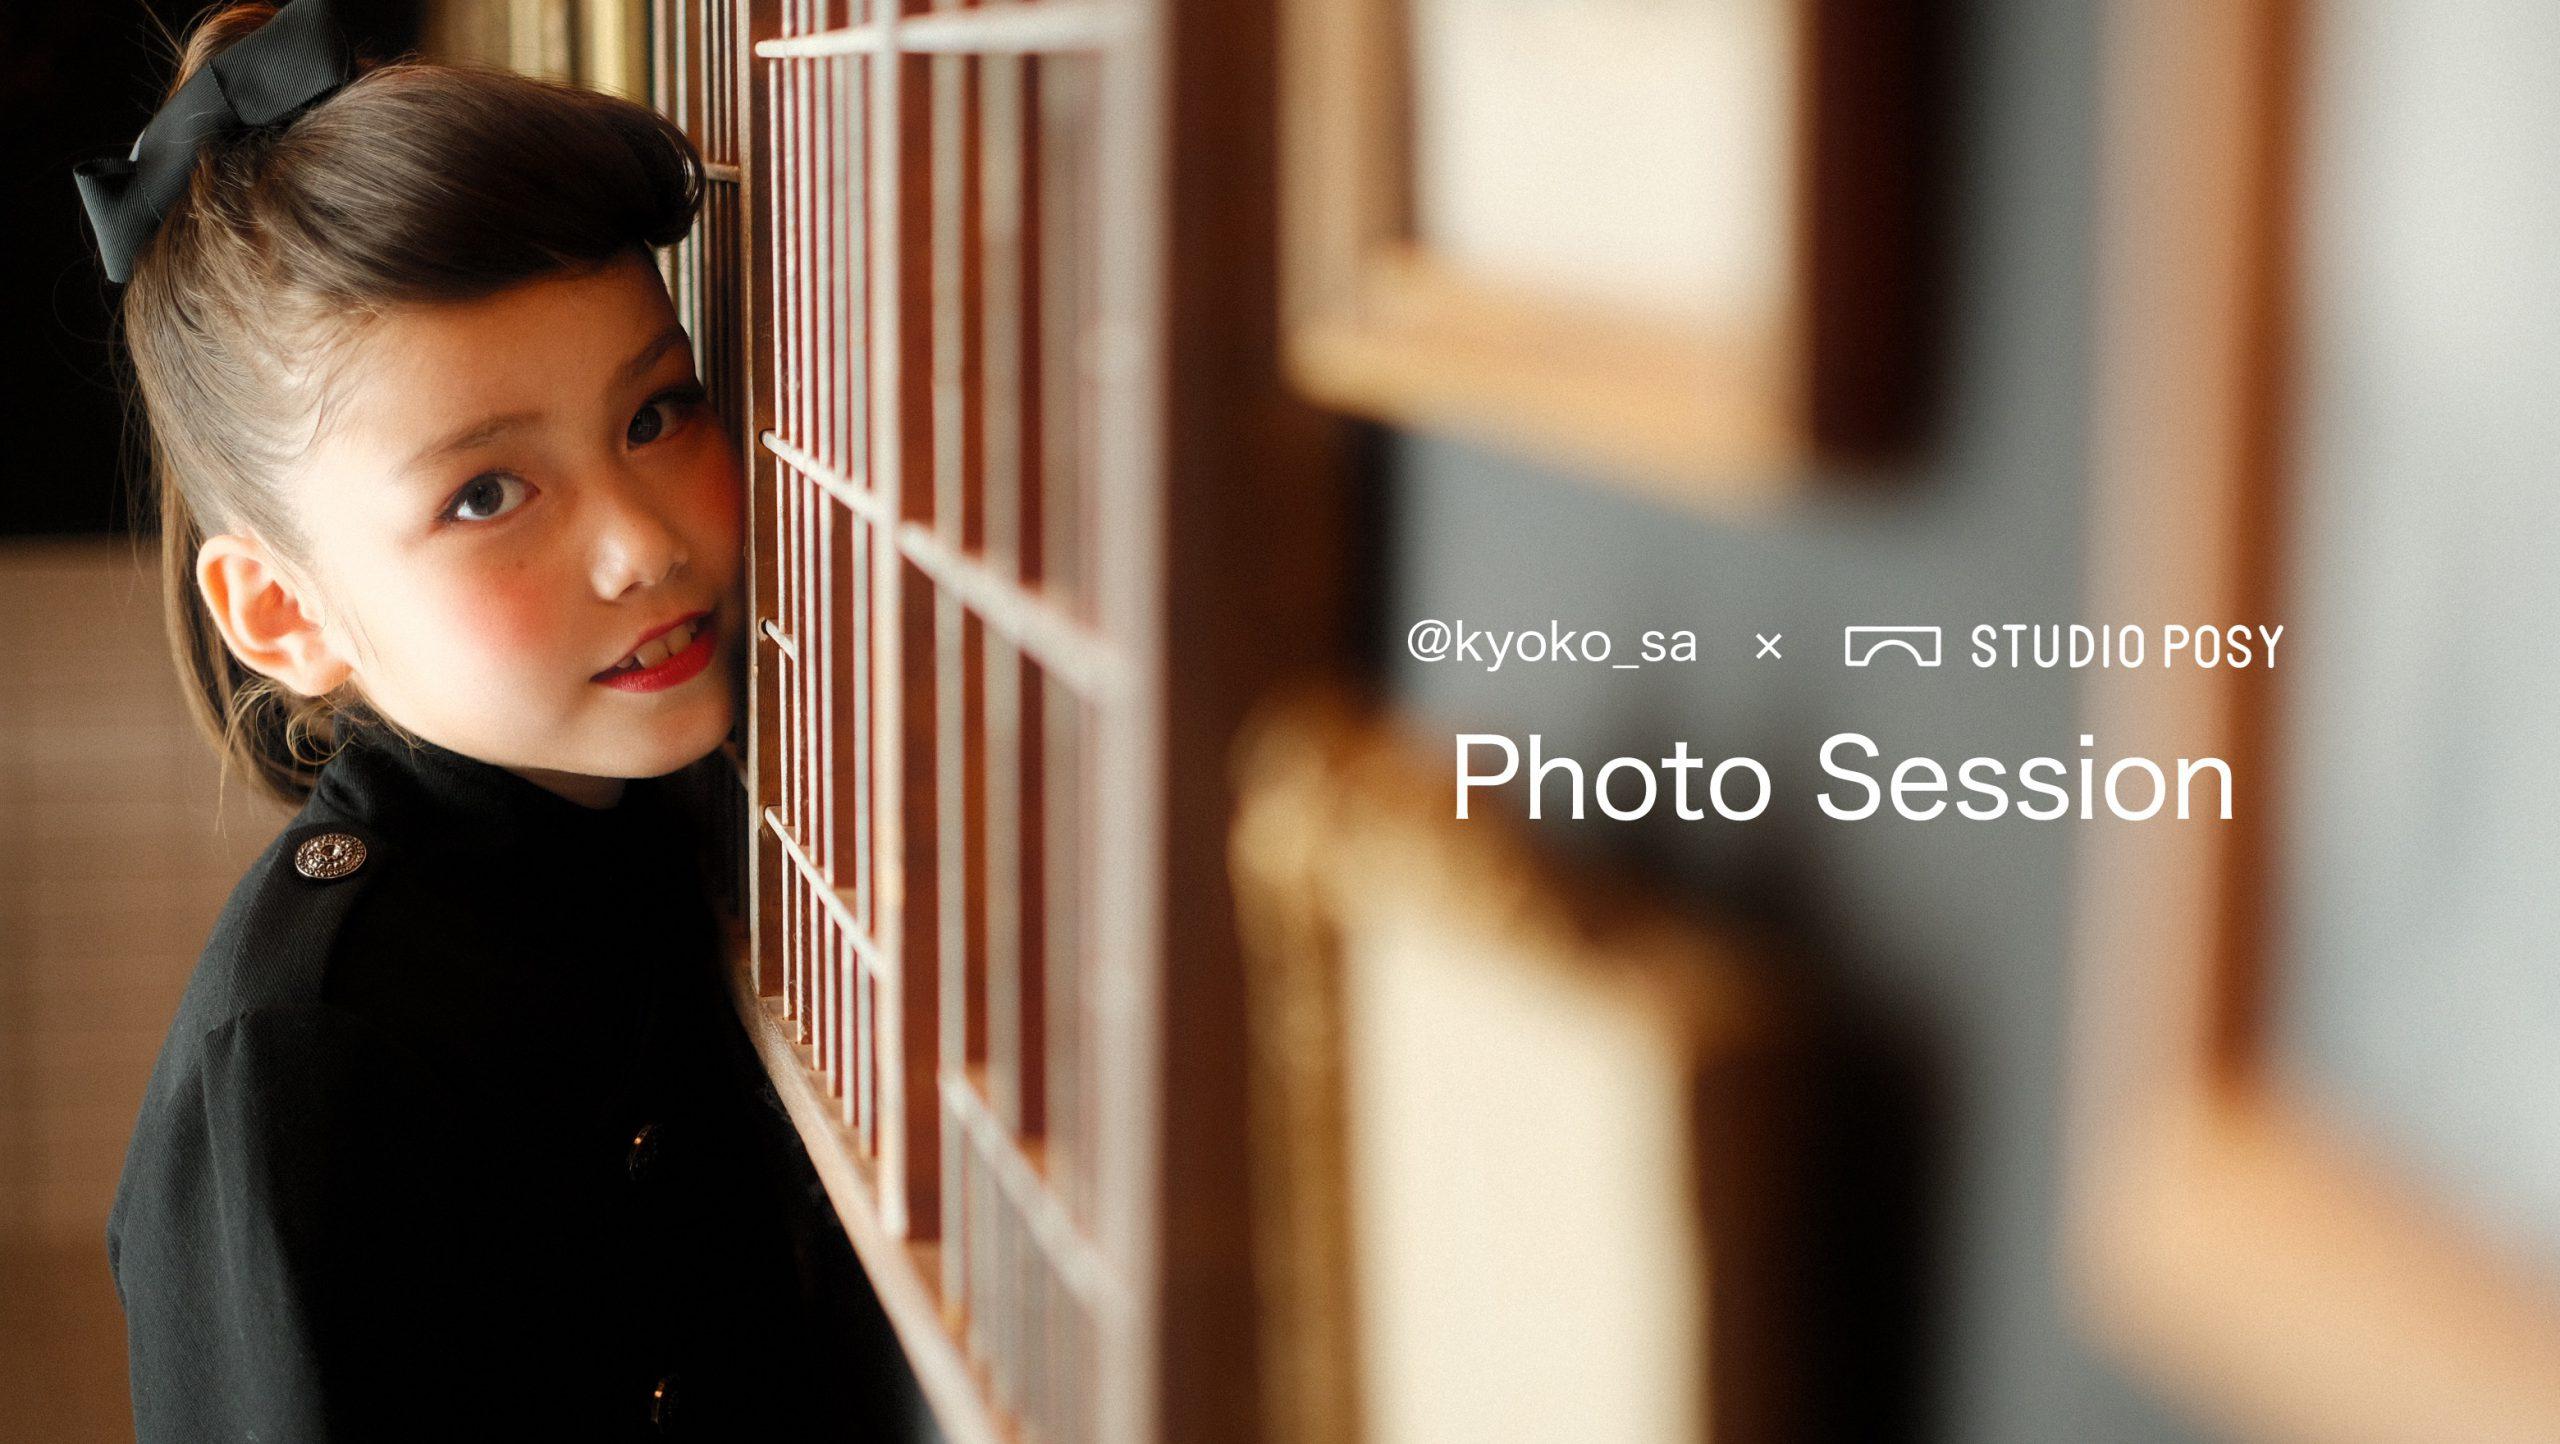 @kyoko_sa × STUDIO POSY  Photo Session  クラシカルガール&ボーイ撮影会【詳細公開】